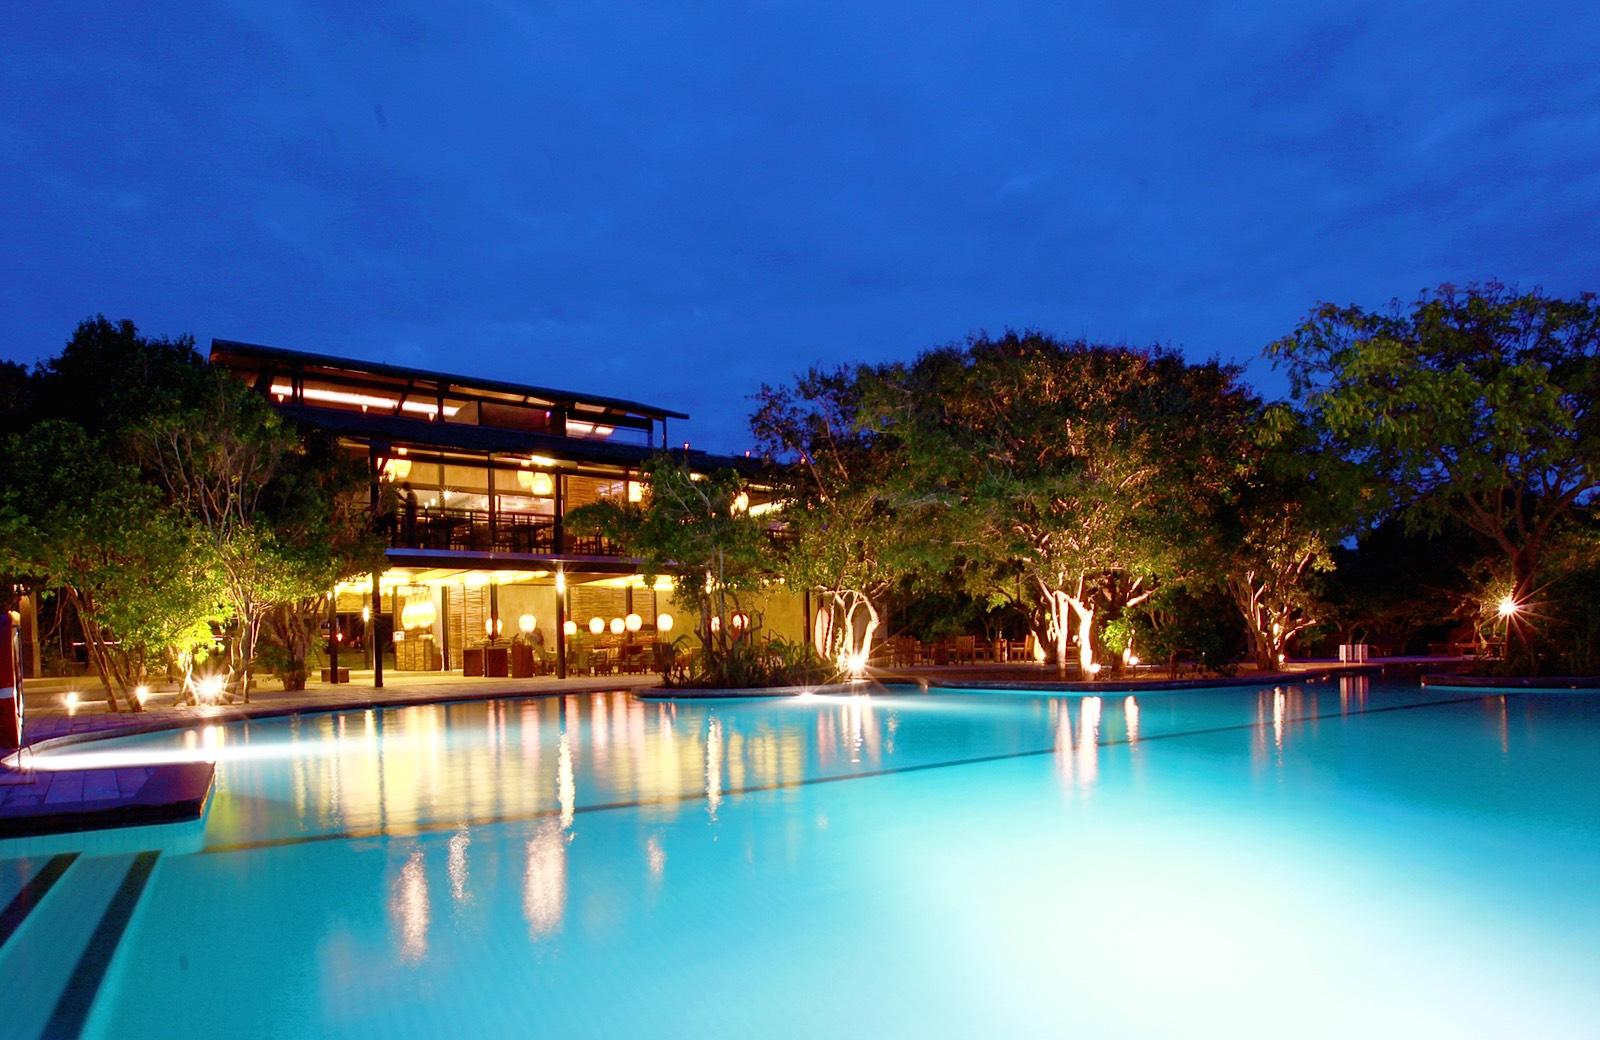 invite-to-paradise-holiday-honeymoon-sri-lanka-specialists-safari-lodge-cinnamon-wild-hotel-1.jpg